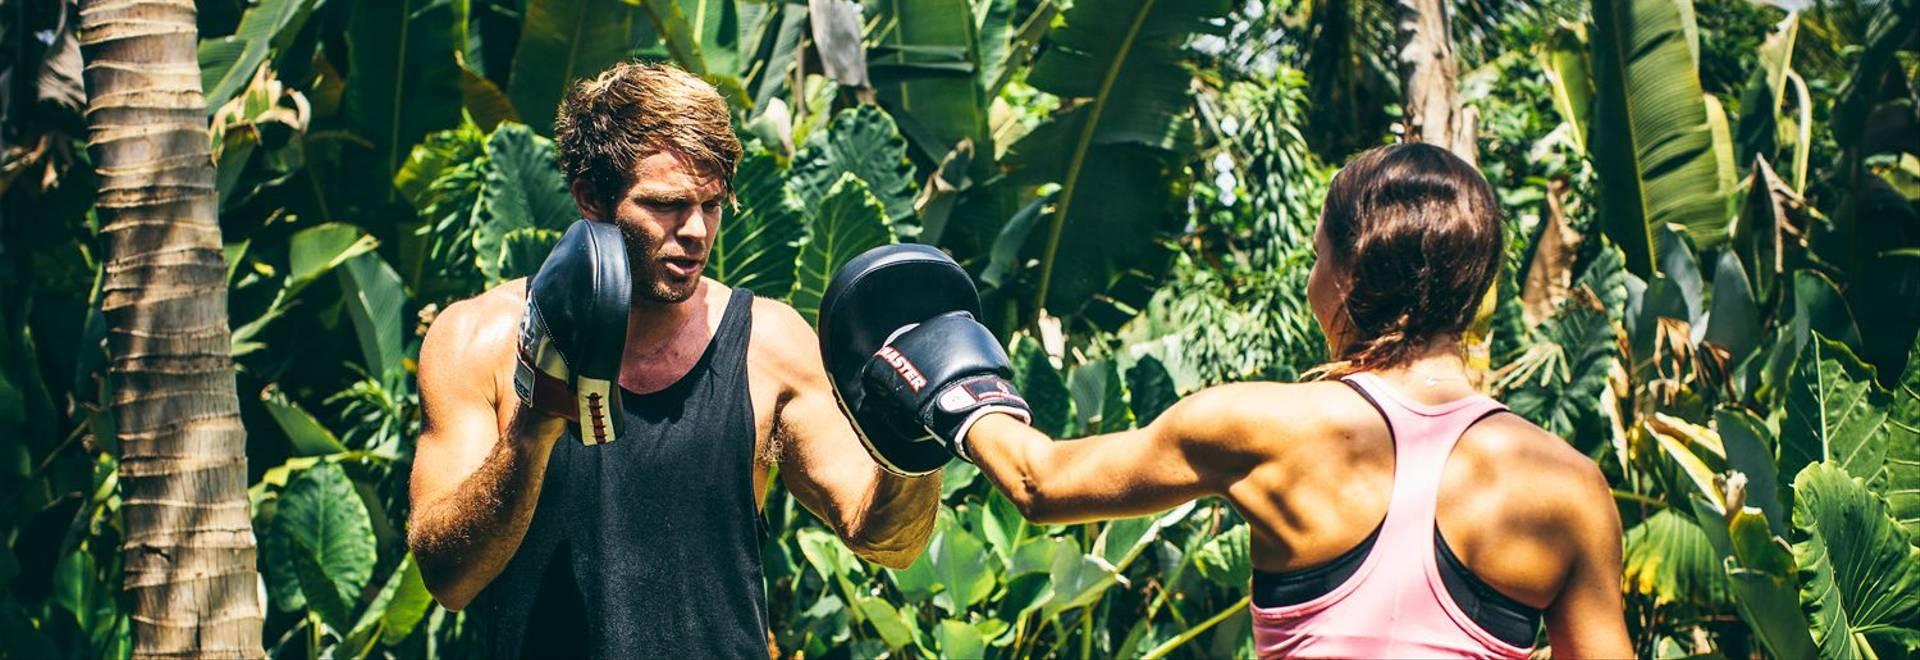 Komune-Bali-boxing-class-1.jpg